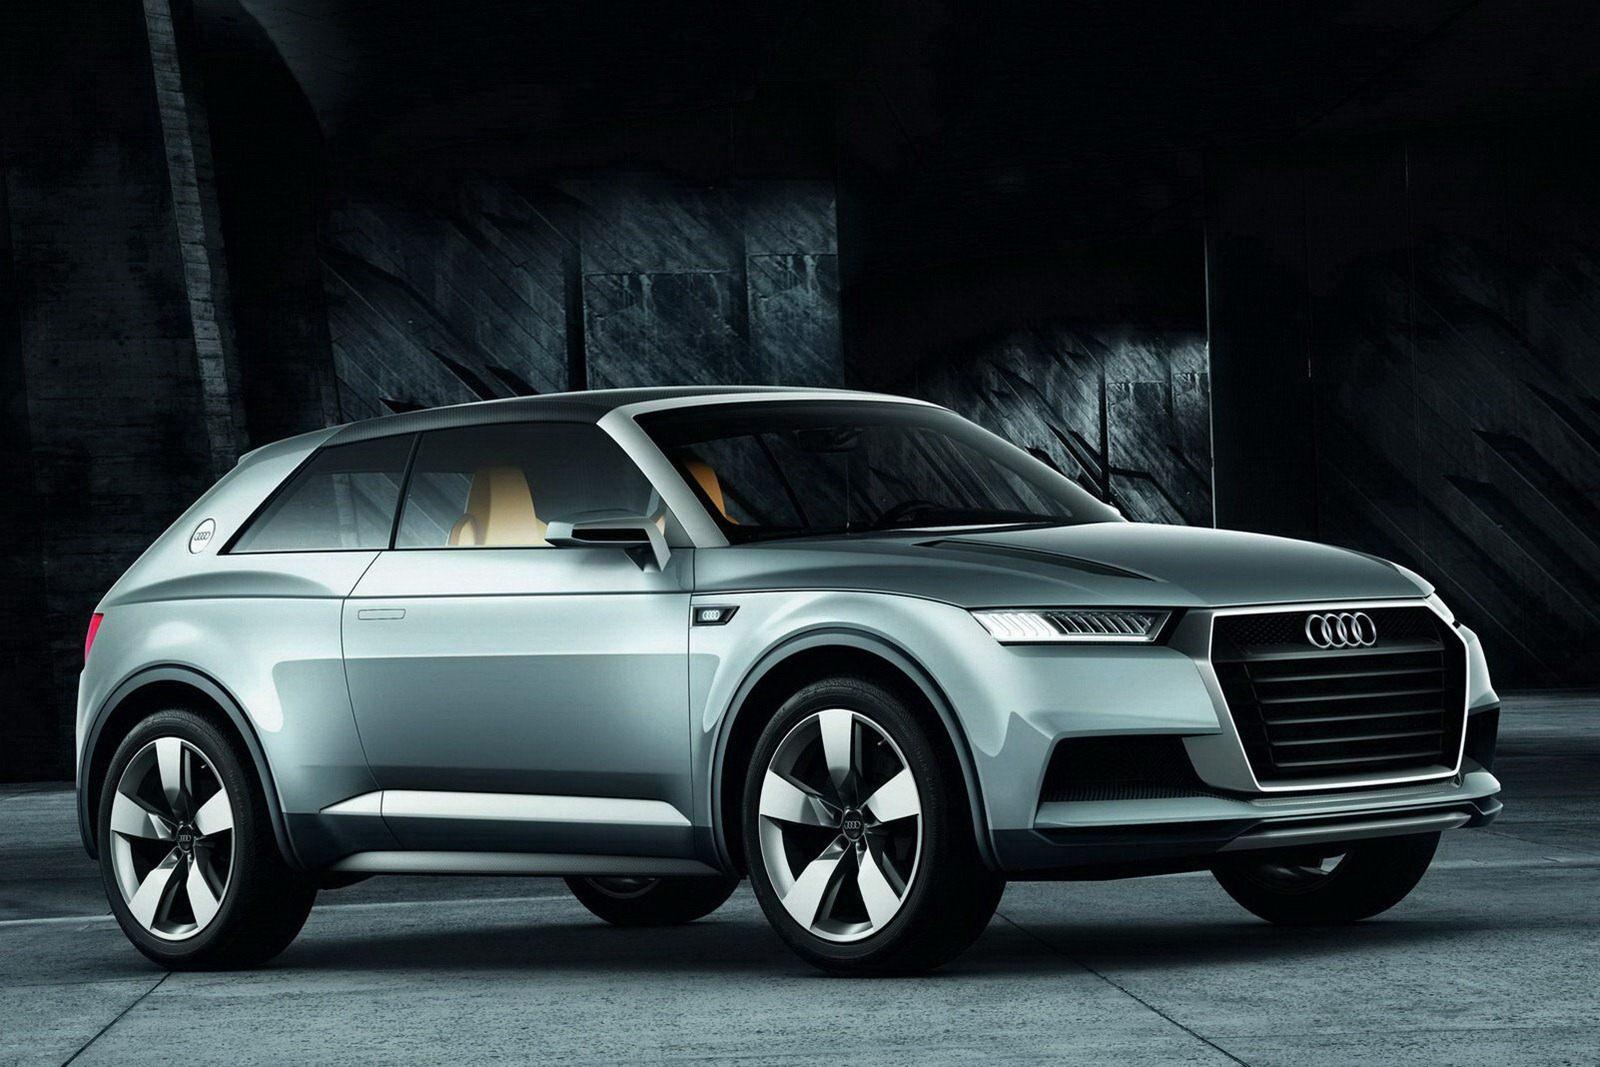 Audi-Crosslane-Coupe-Concept-01[3]